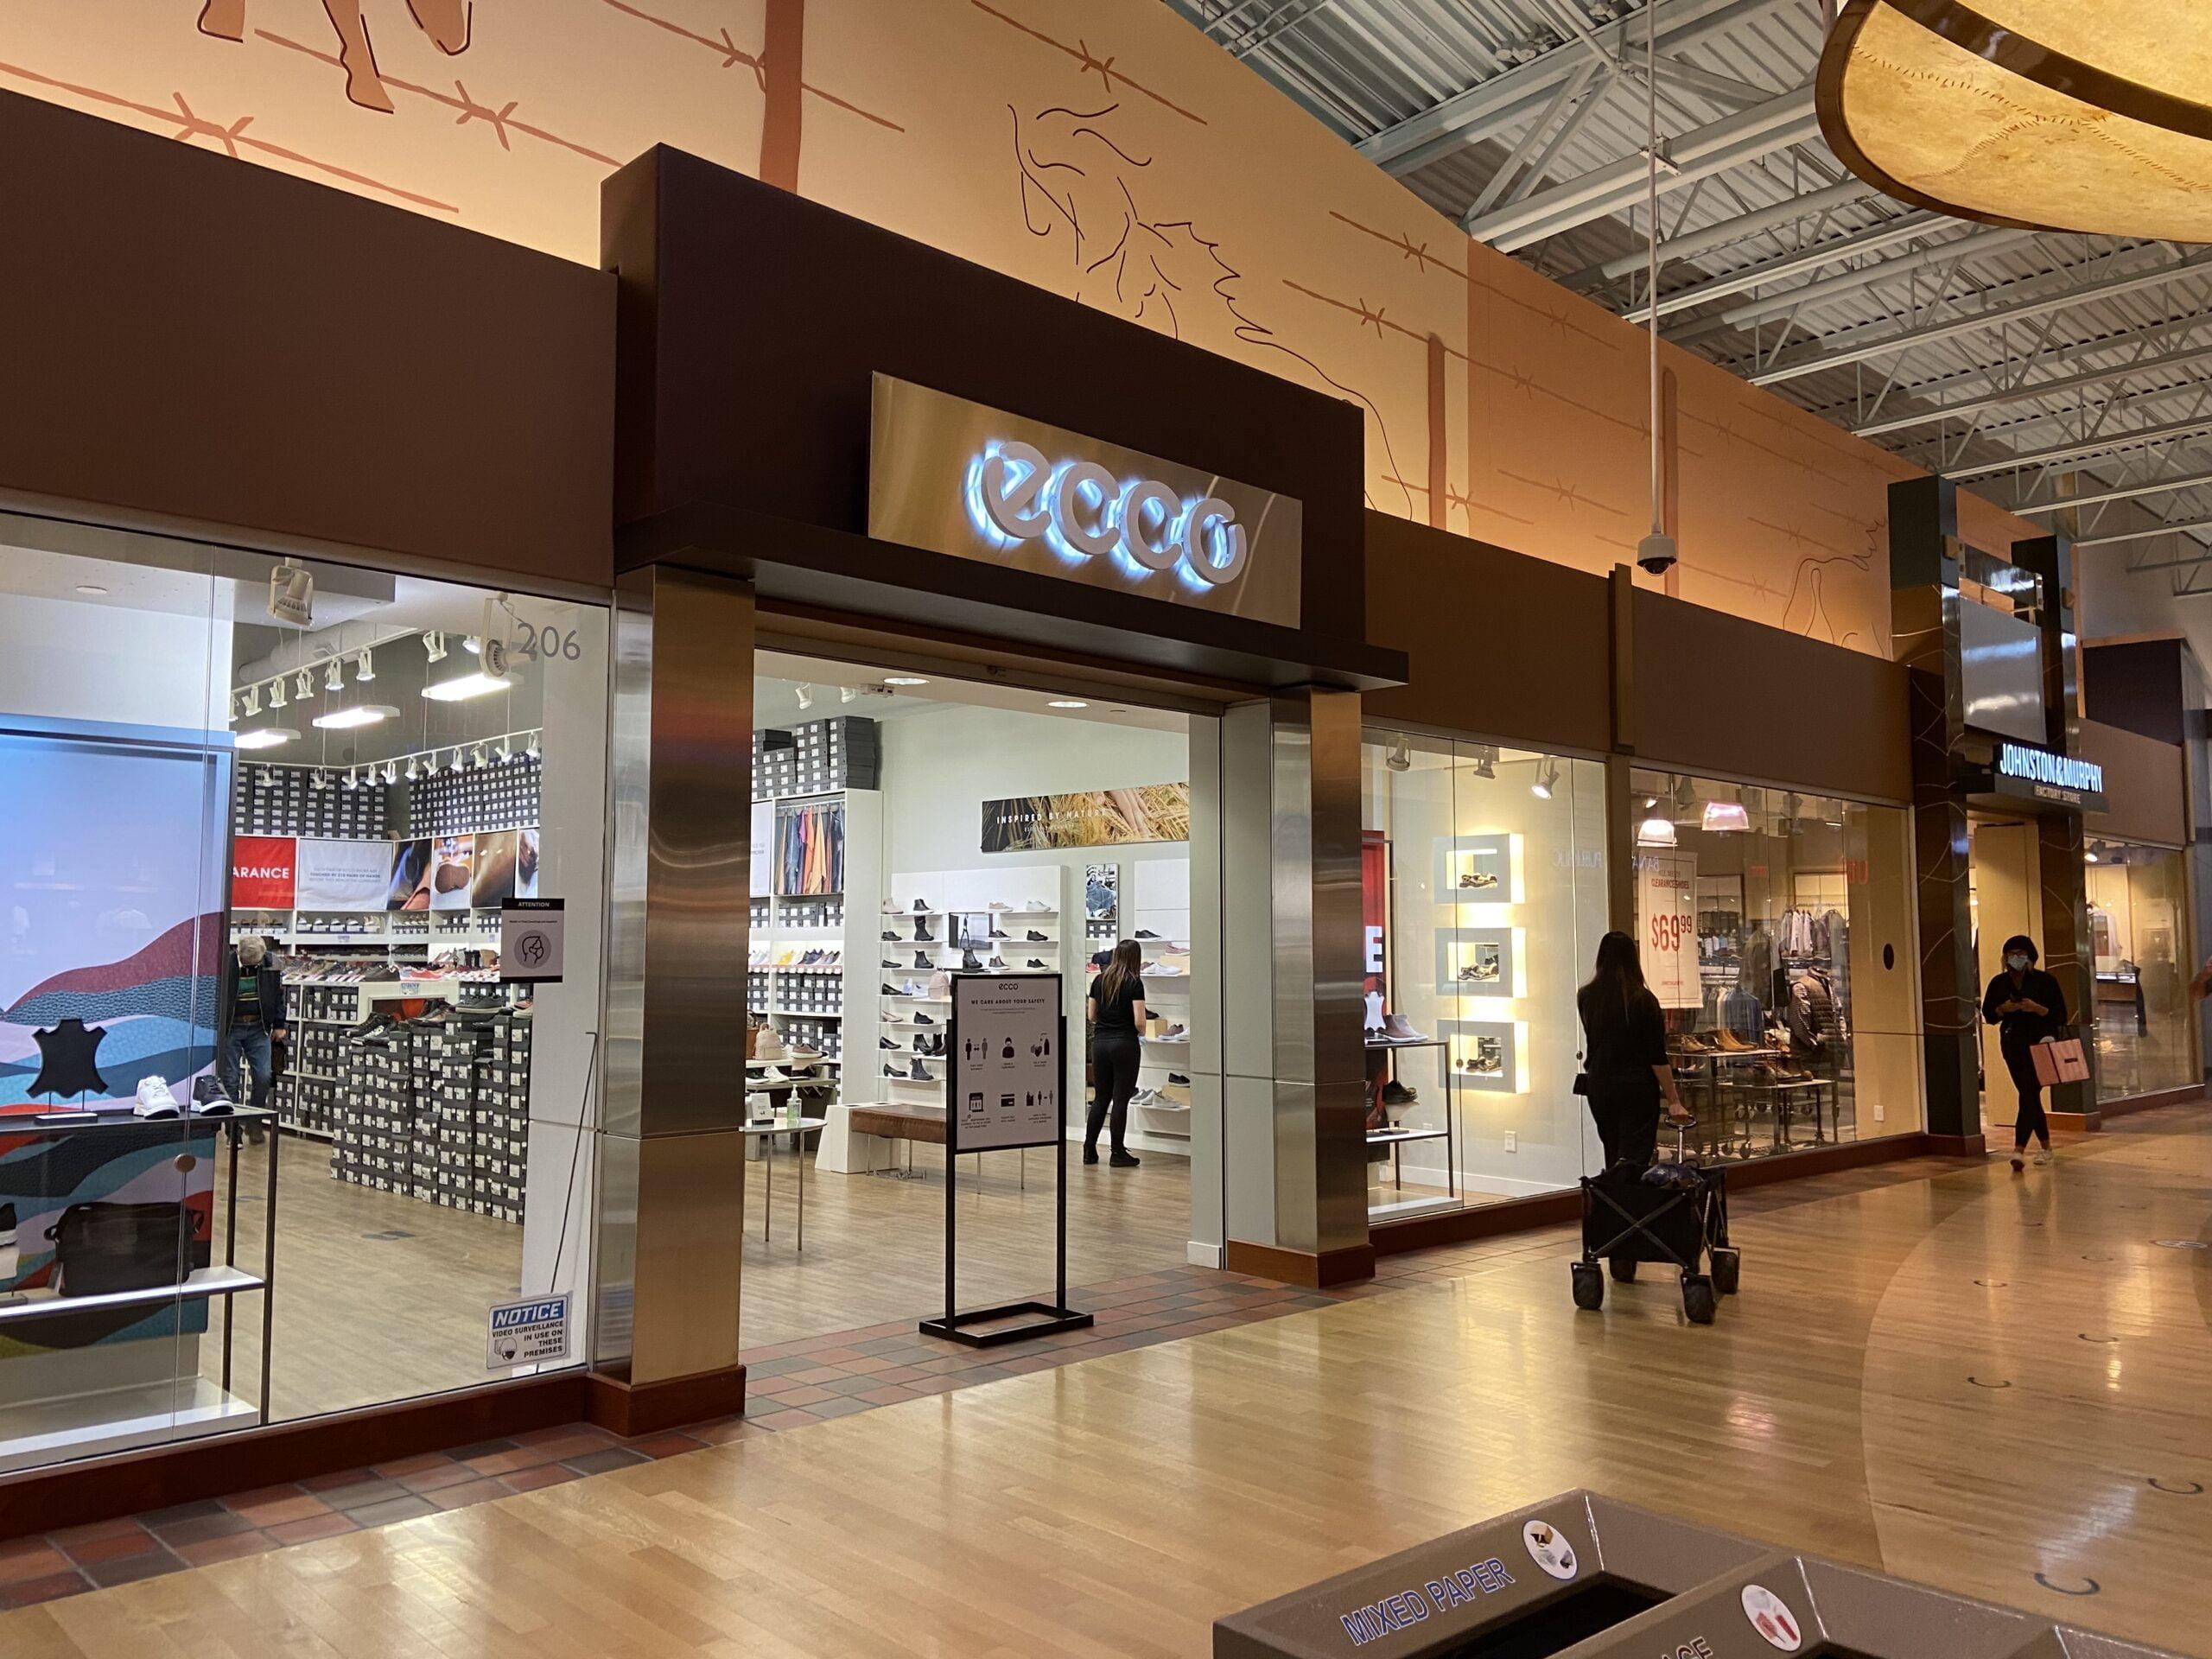 ECCO Shoes at CrossIron Mills